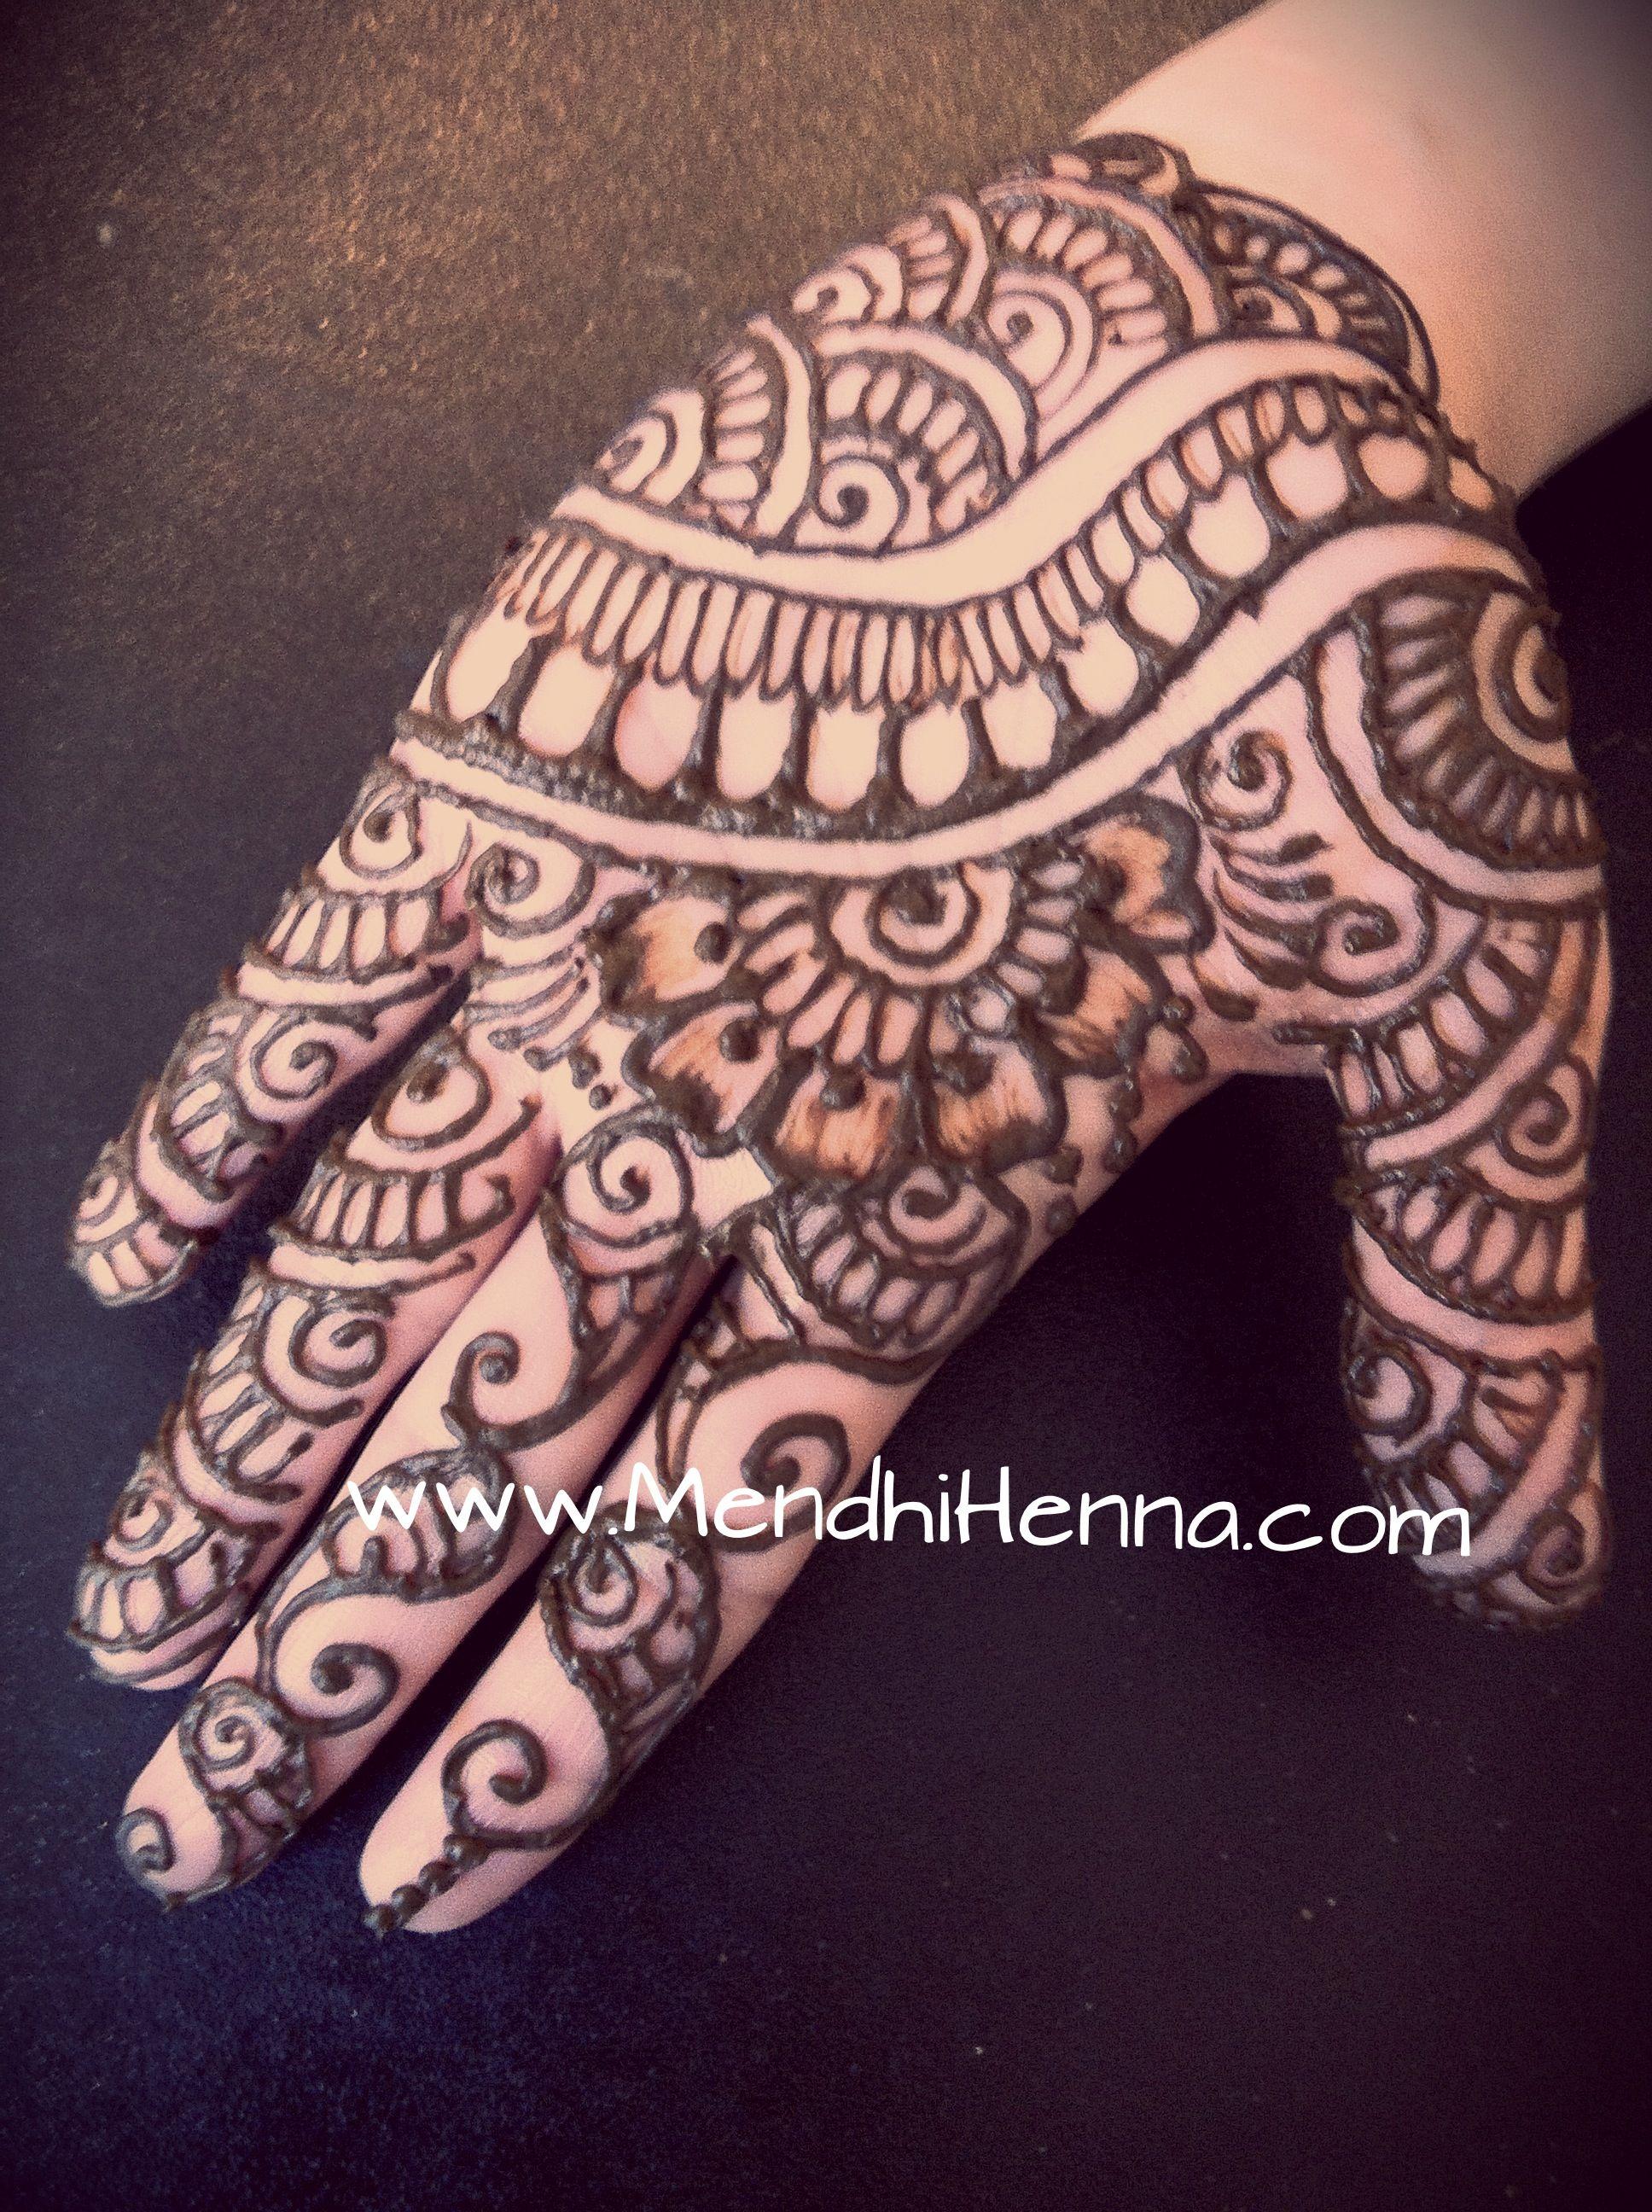 Mehndi Henna Sacramento : Mendhi my future wedding pinterest henna festivals